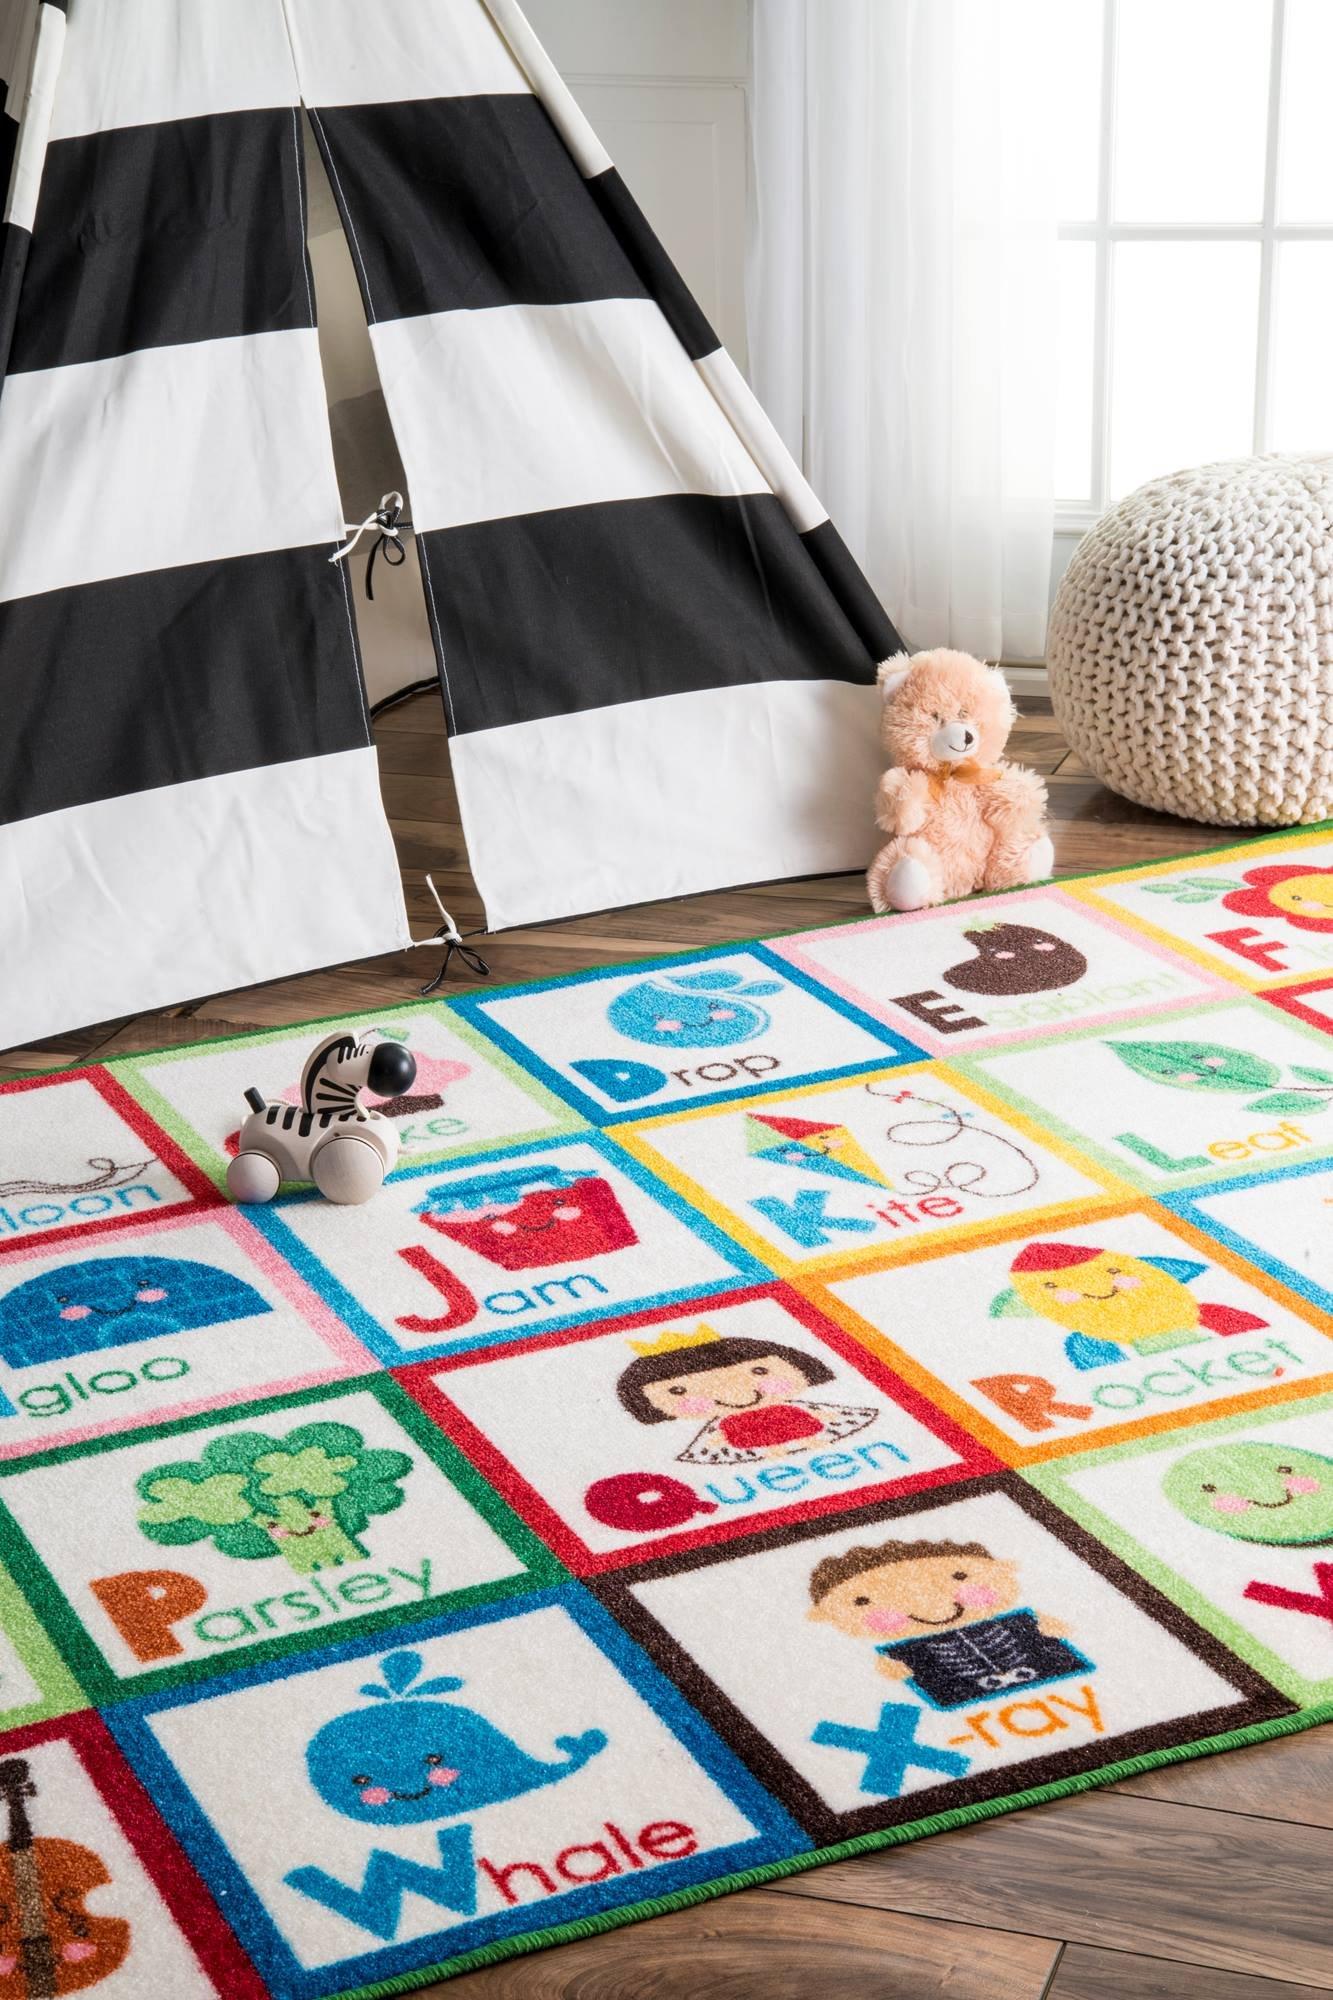 nuLOOM Nursery Alphabet Block Cartoons Kids Area Rugs, 5' x 7' 5'', Multicolor